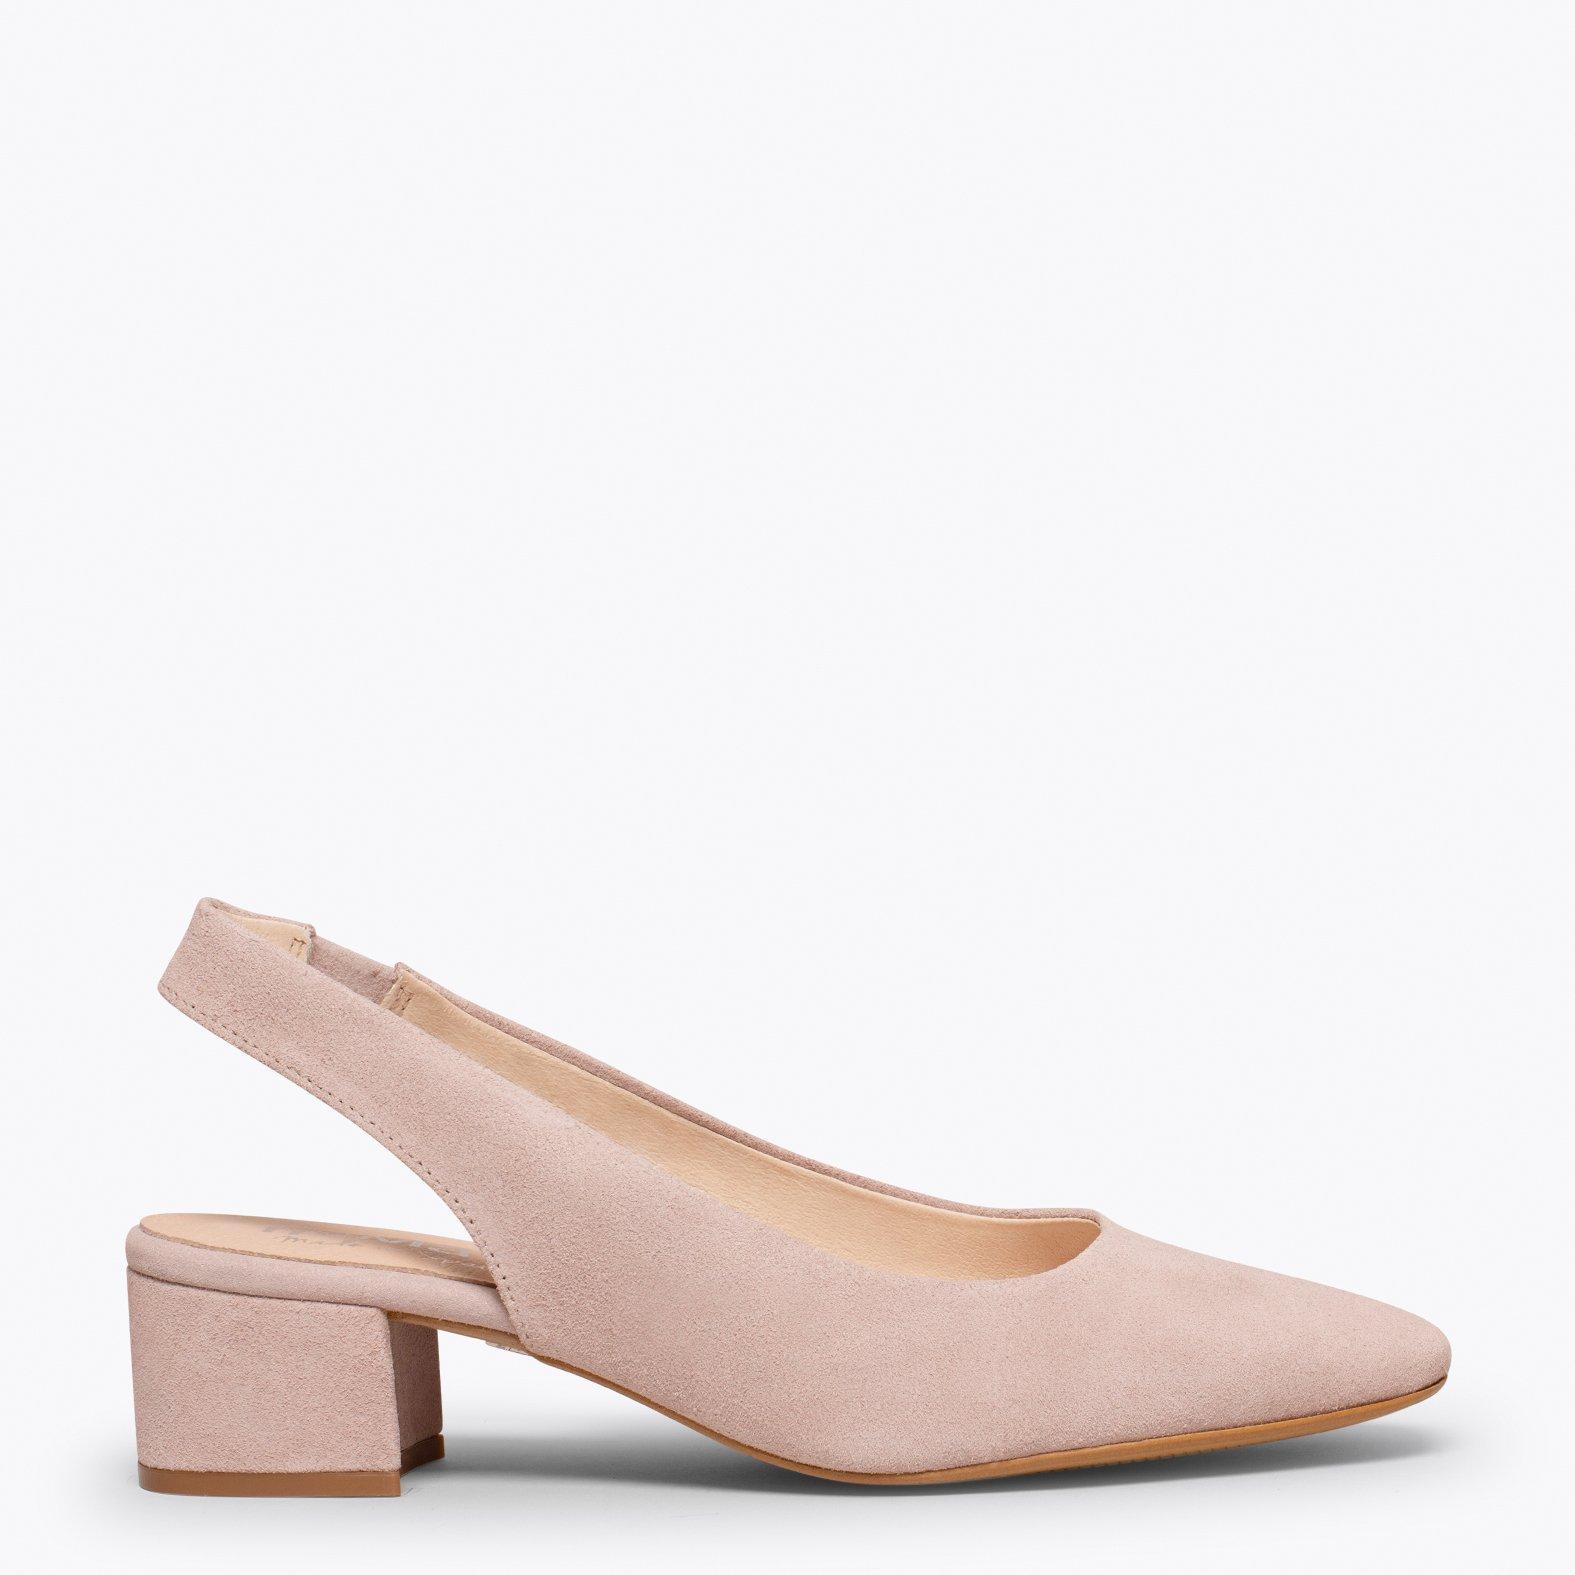 LADY Zapato destalonado con puntera cuadrada ROSA PALO